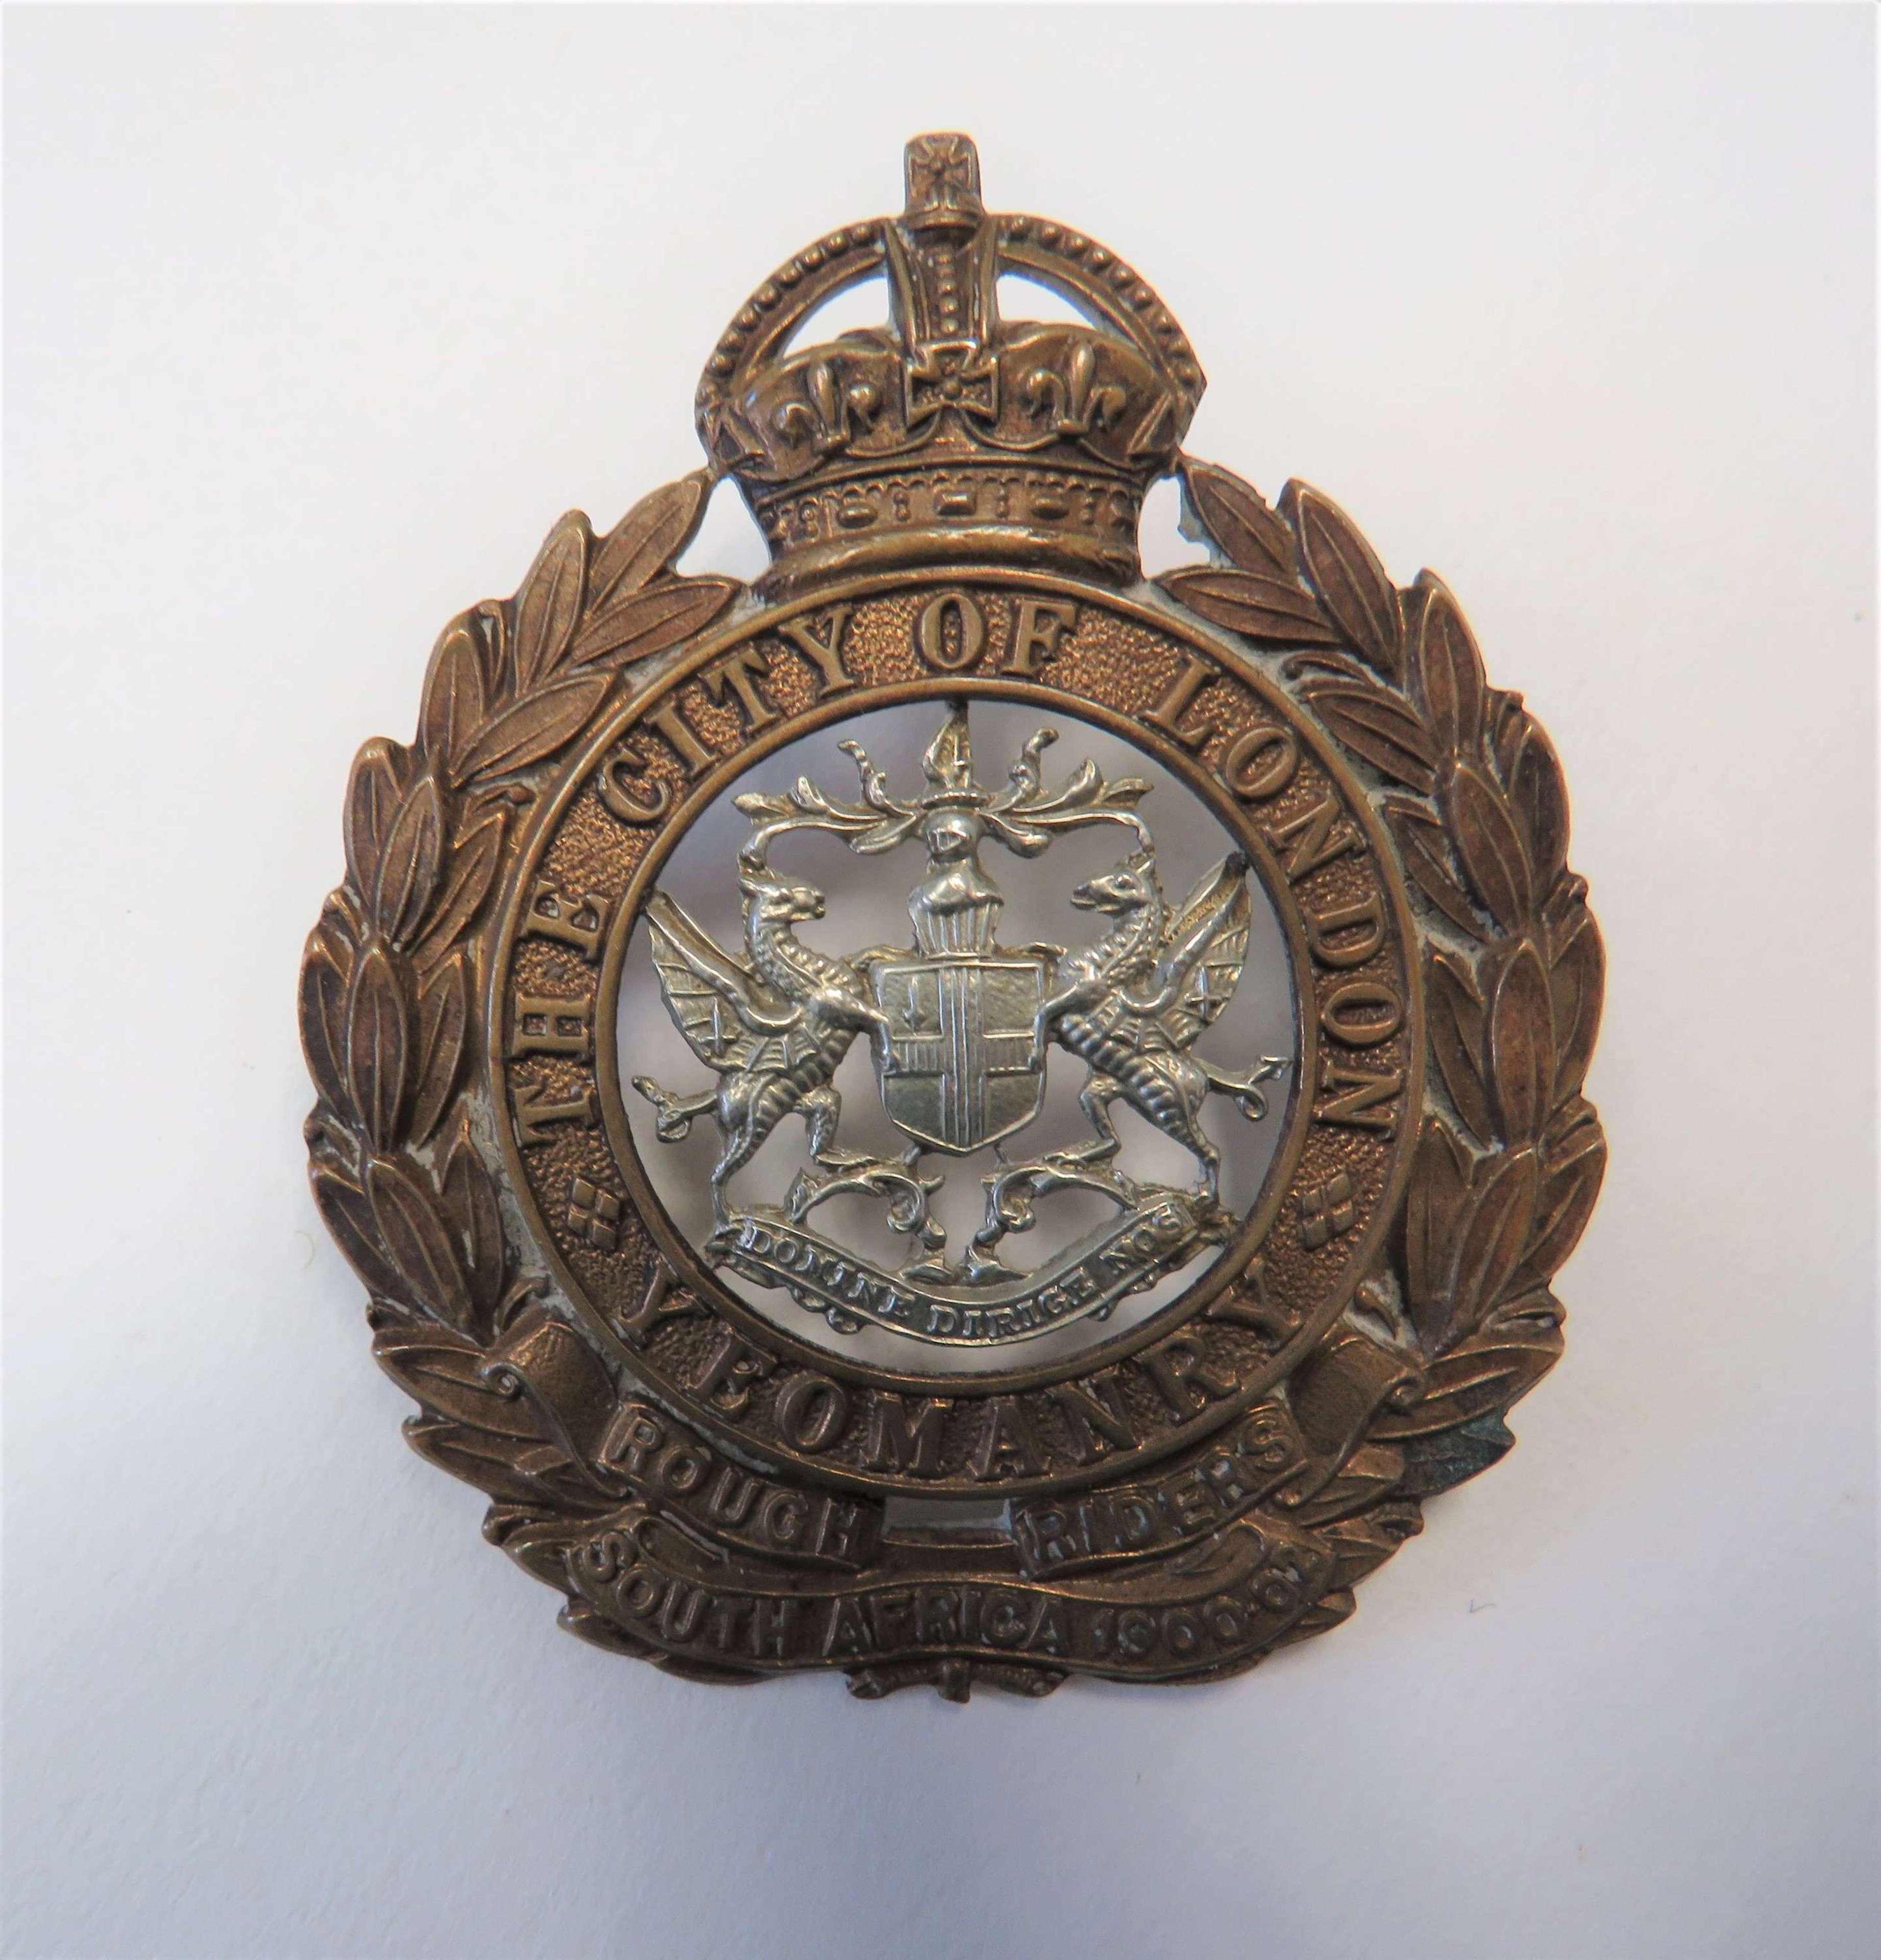 Post 1901 City of London Yeomanry Rough Riders Cap Badge